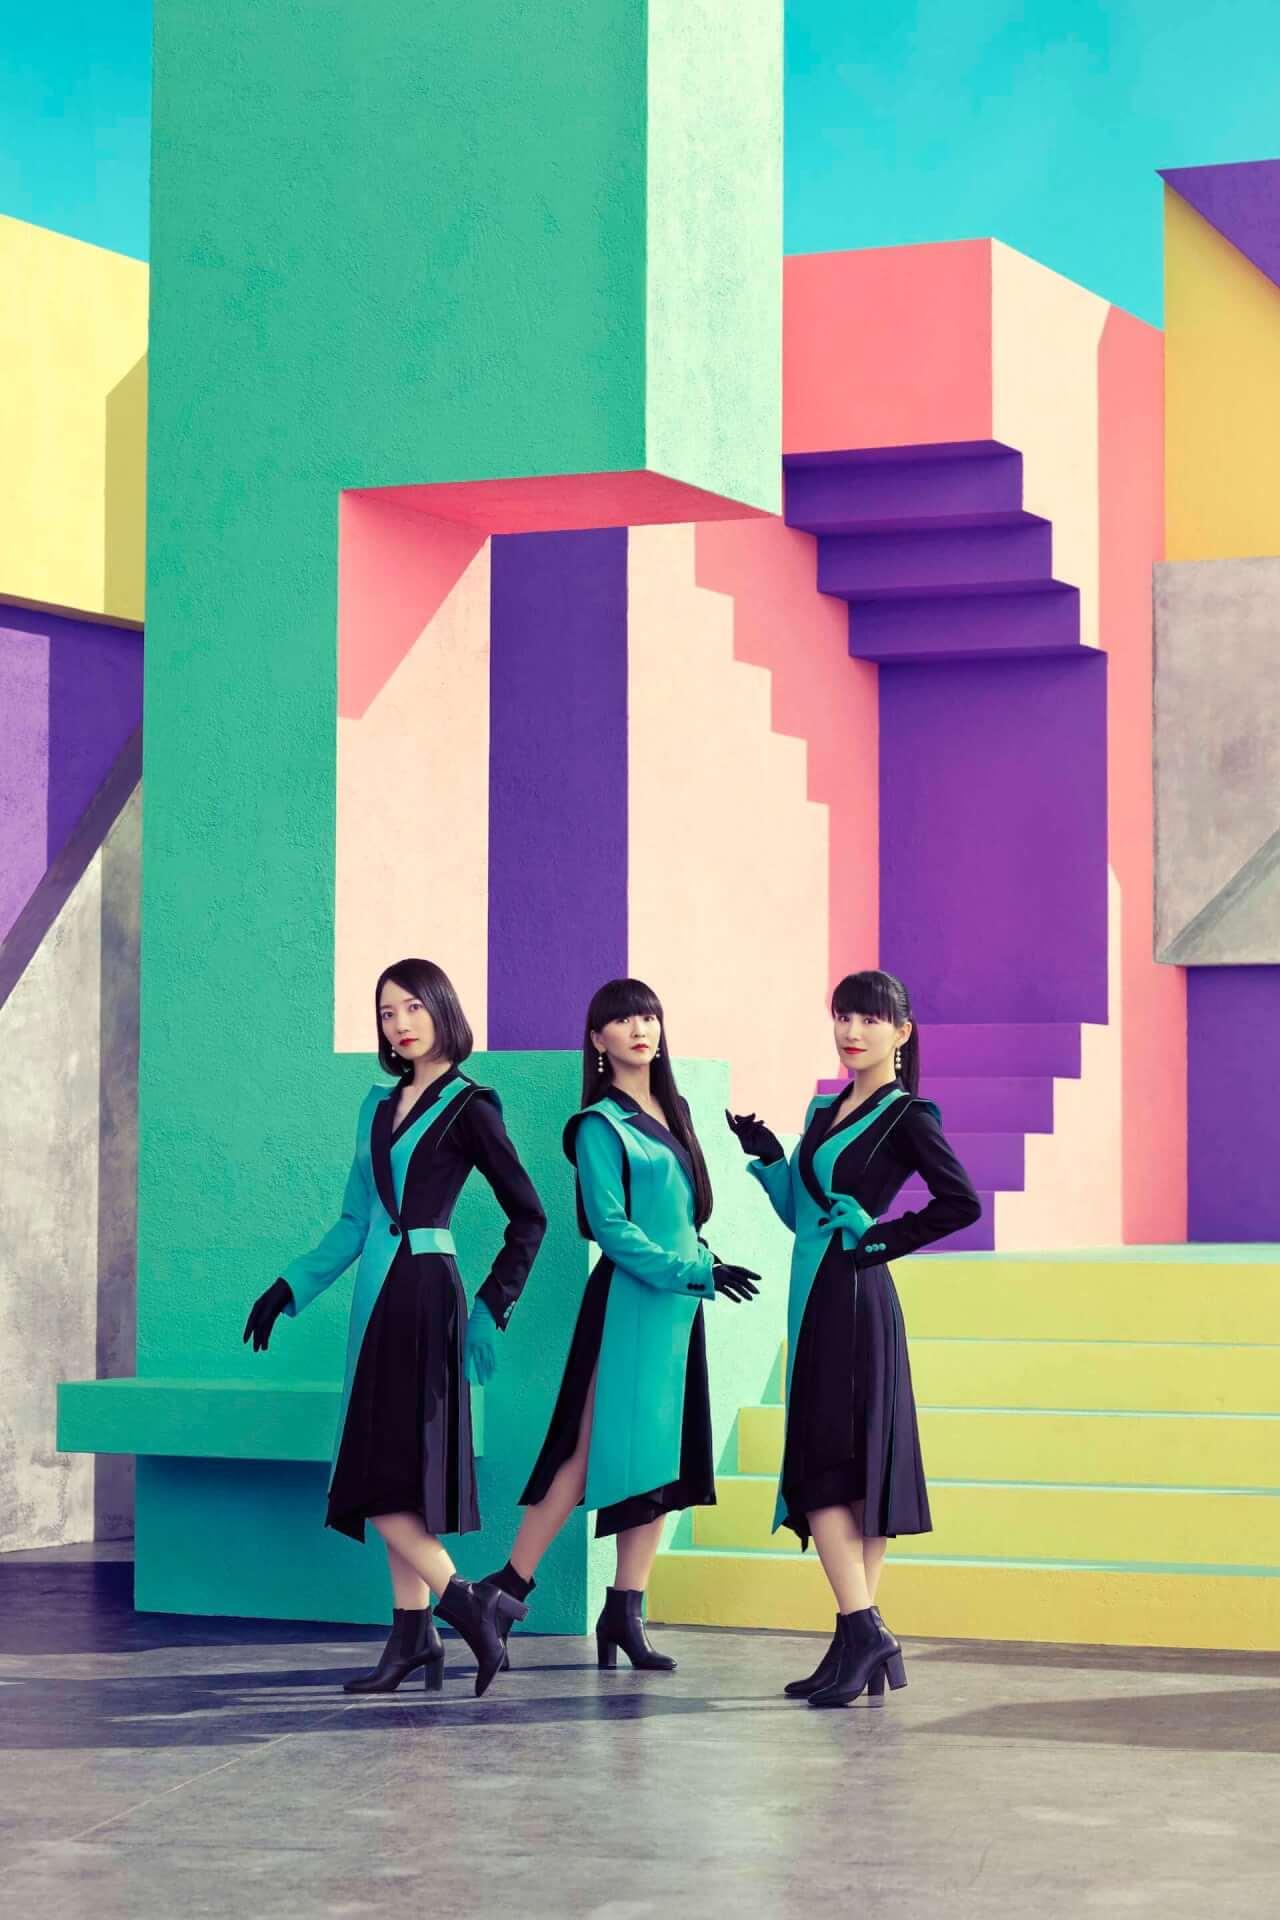 Perfume初の衣装本が『Perfume COSTUME BOOK 2005-2020』発売決定!6つの周年事業すべて発表 music200918_perfume_3